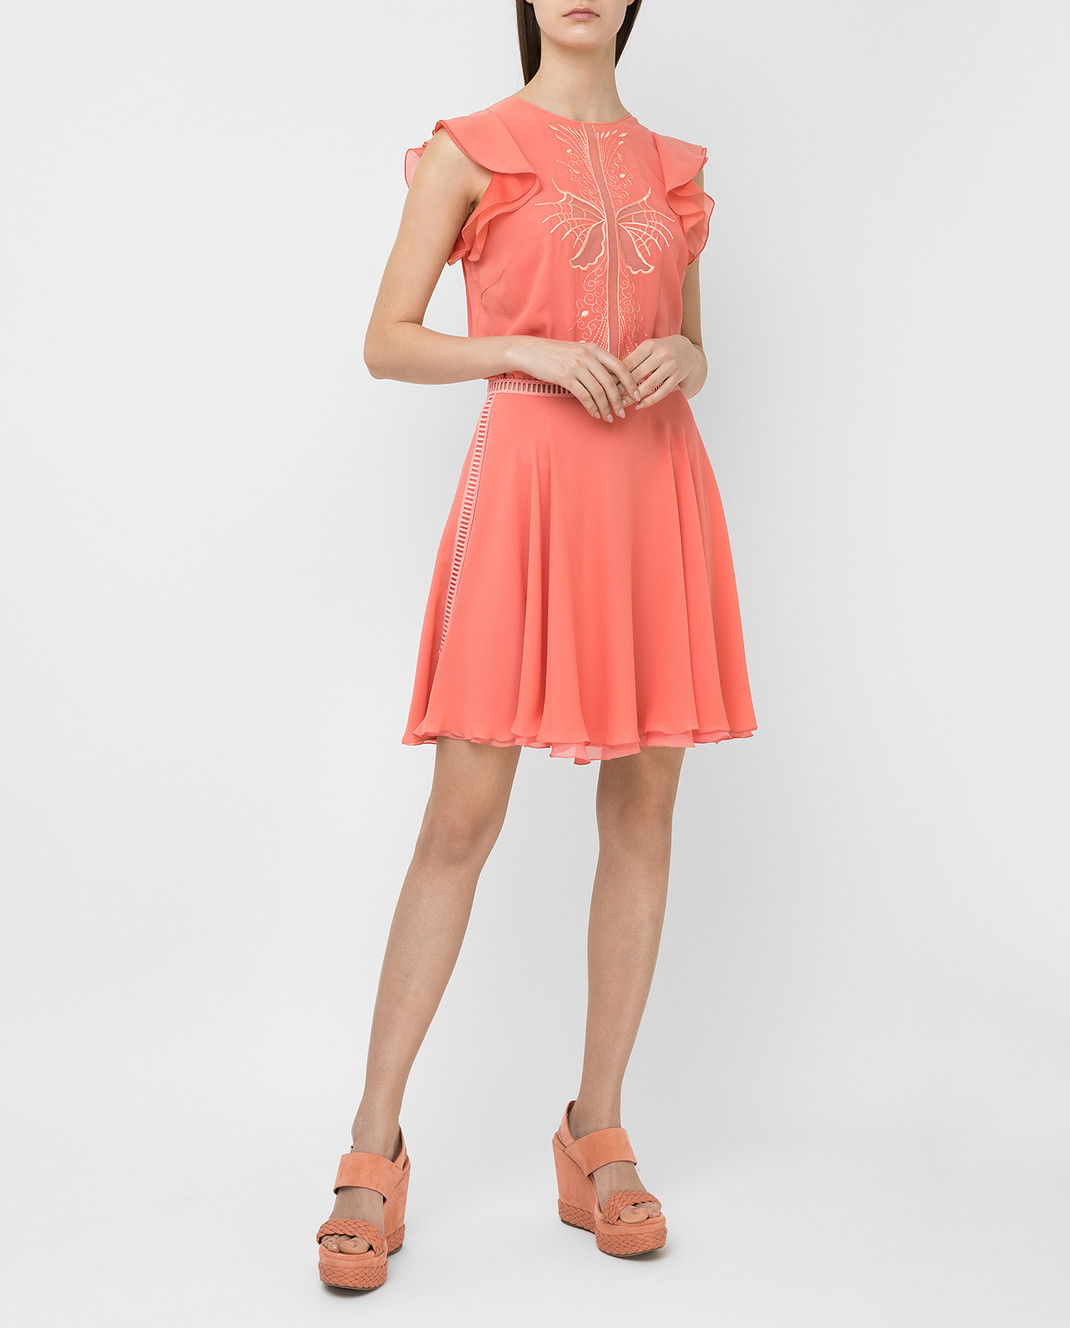 Giamba Коралловое платье из шелка PG5250 изображение 2